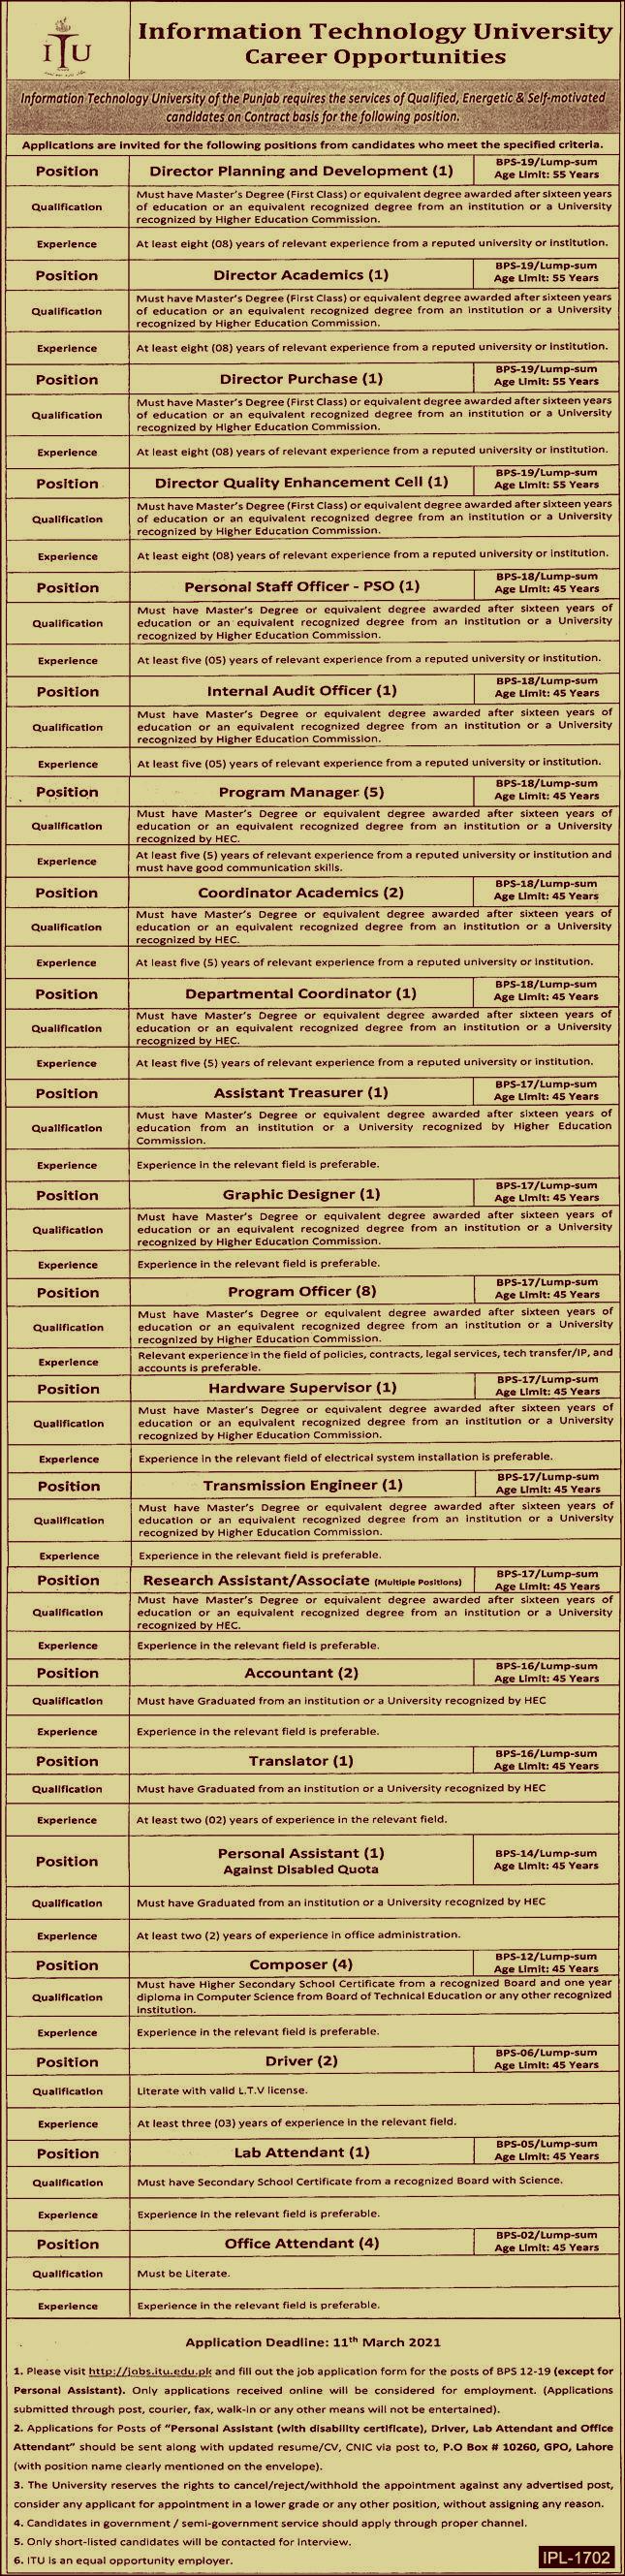 Jobs in Information Technology University 2021